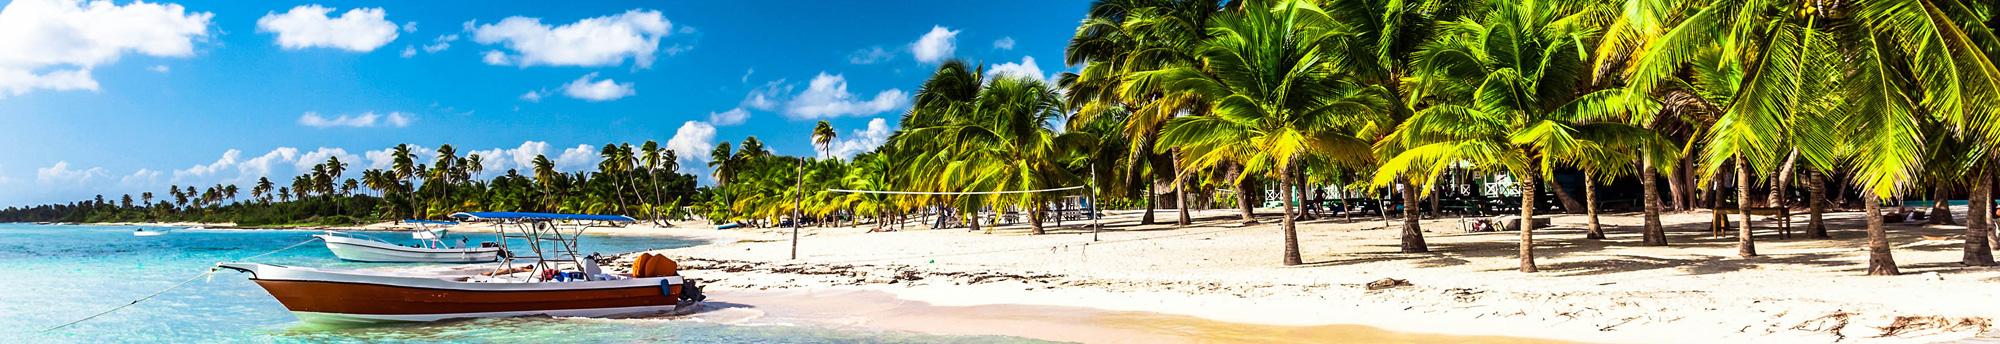 ¡Viaja a Punta Cana!